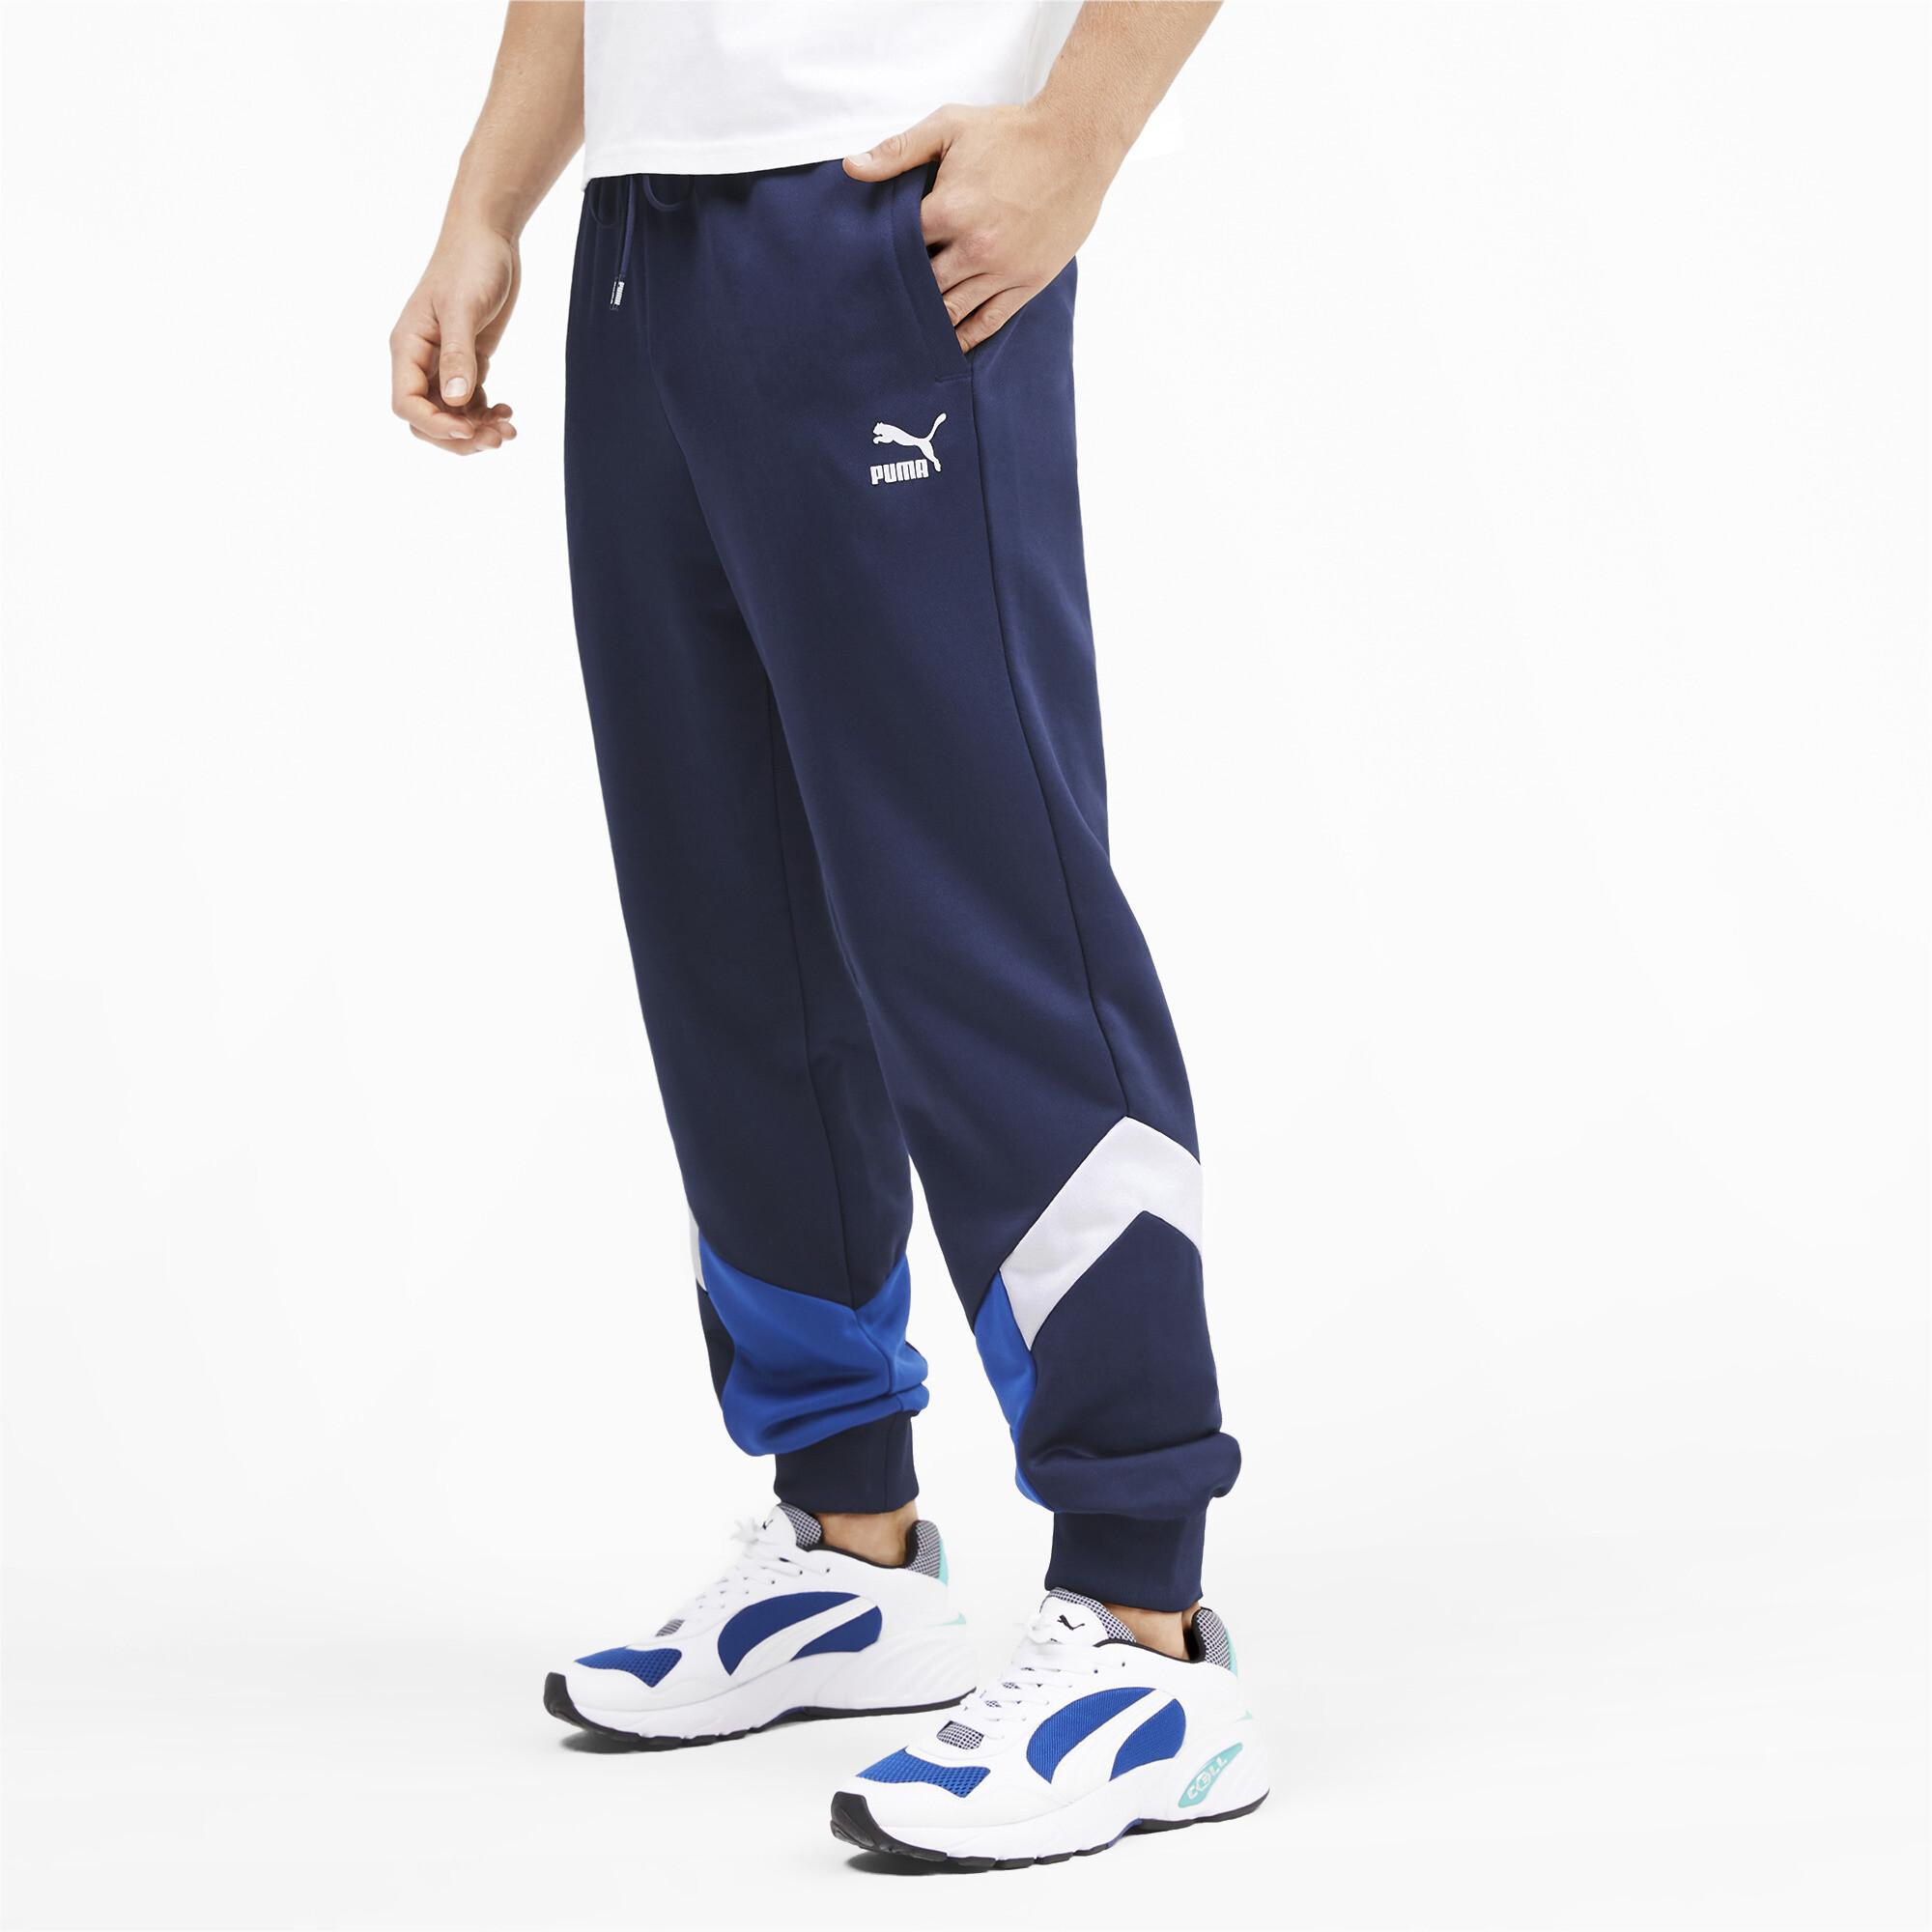 PUMA-Iconic-MCS-Men-039-s-Track-Pants-Men-Knitted-Pants-Sport-Classics thumbnail 20